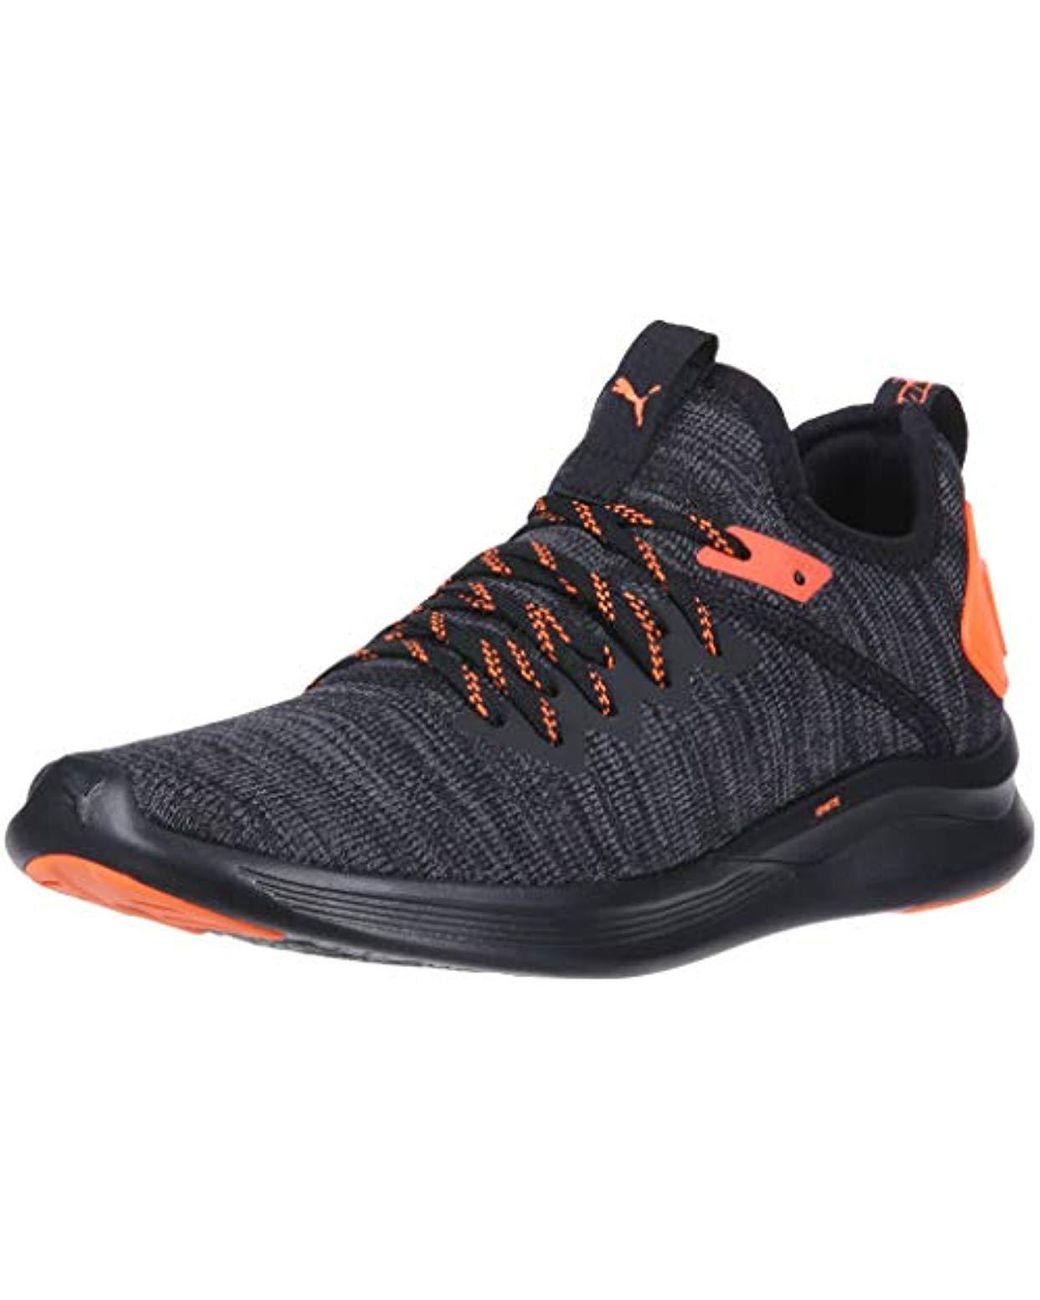 official photos 2d87b 80ce3 Men's Black Ignite Flash Evoknit Sneaker